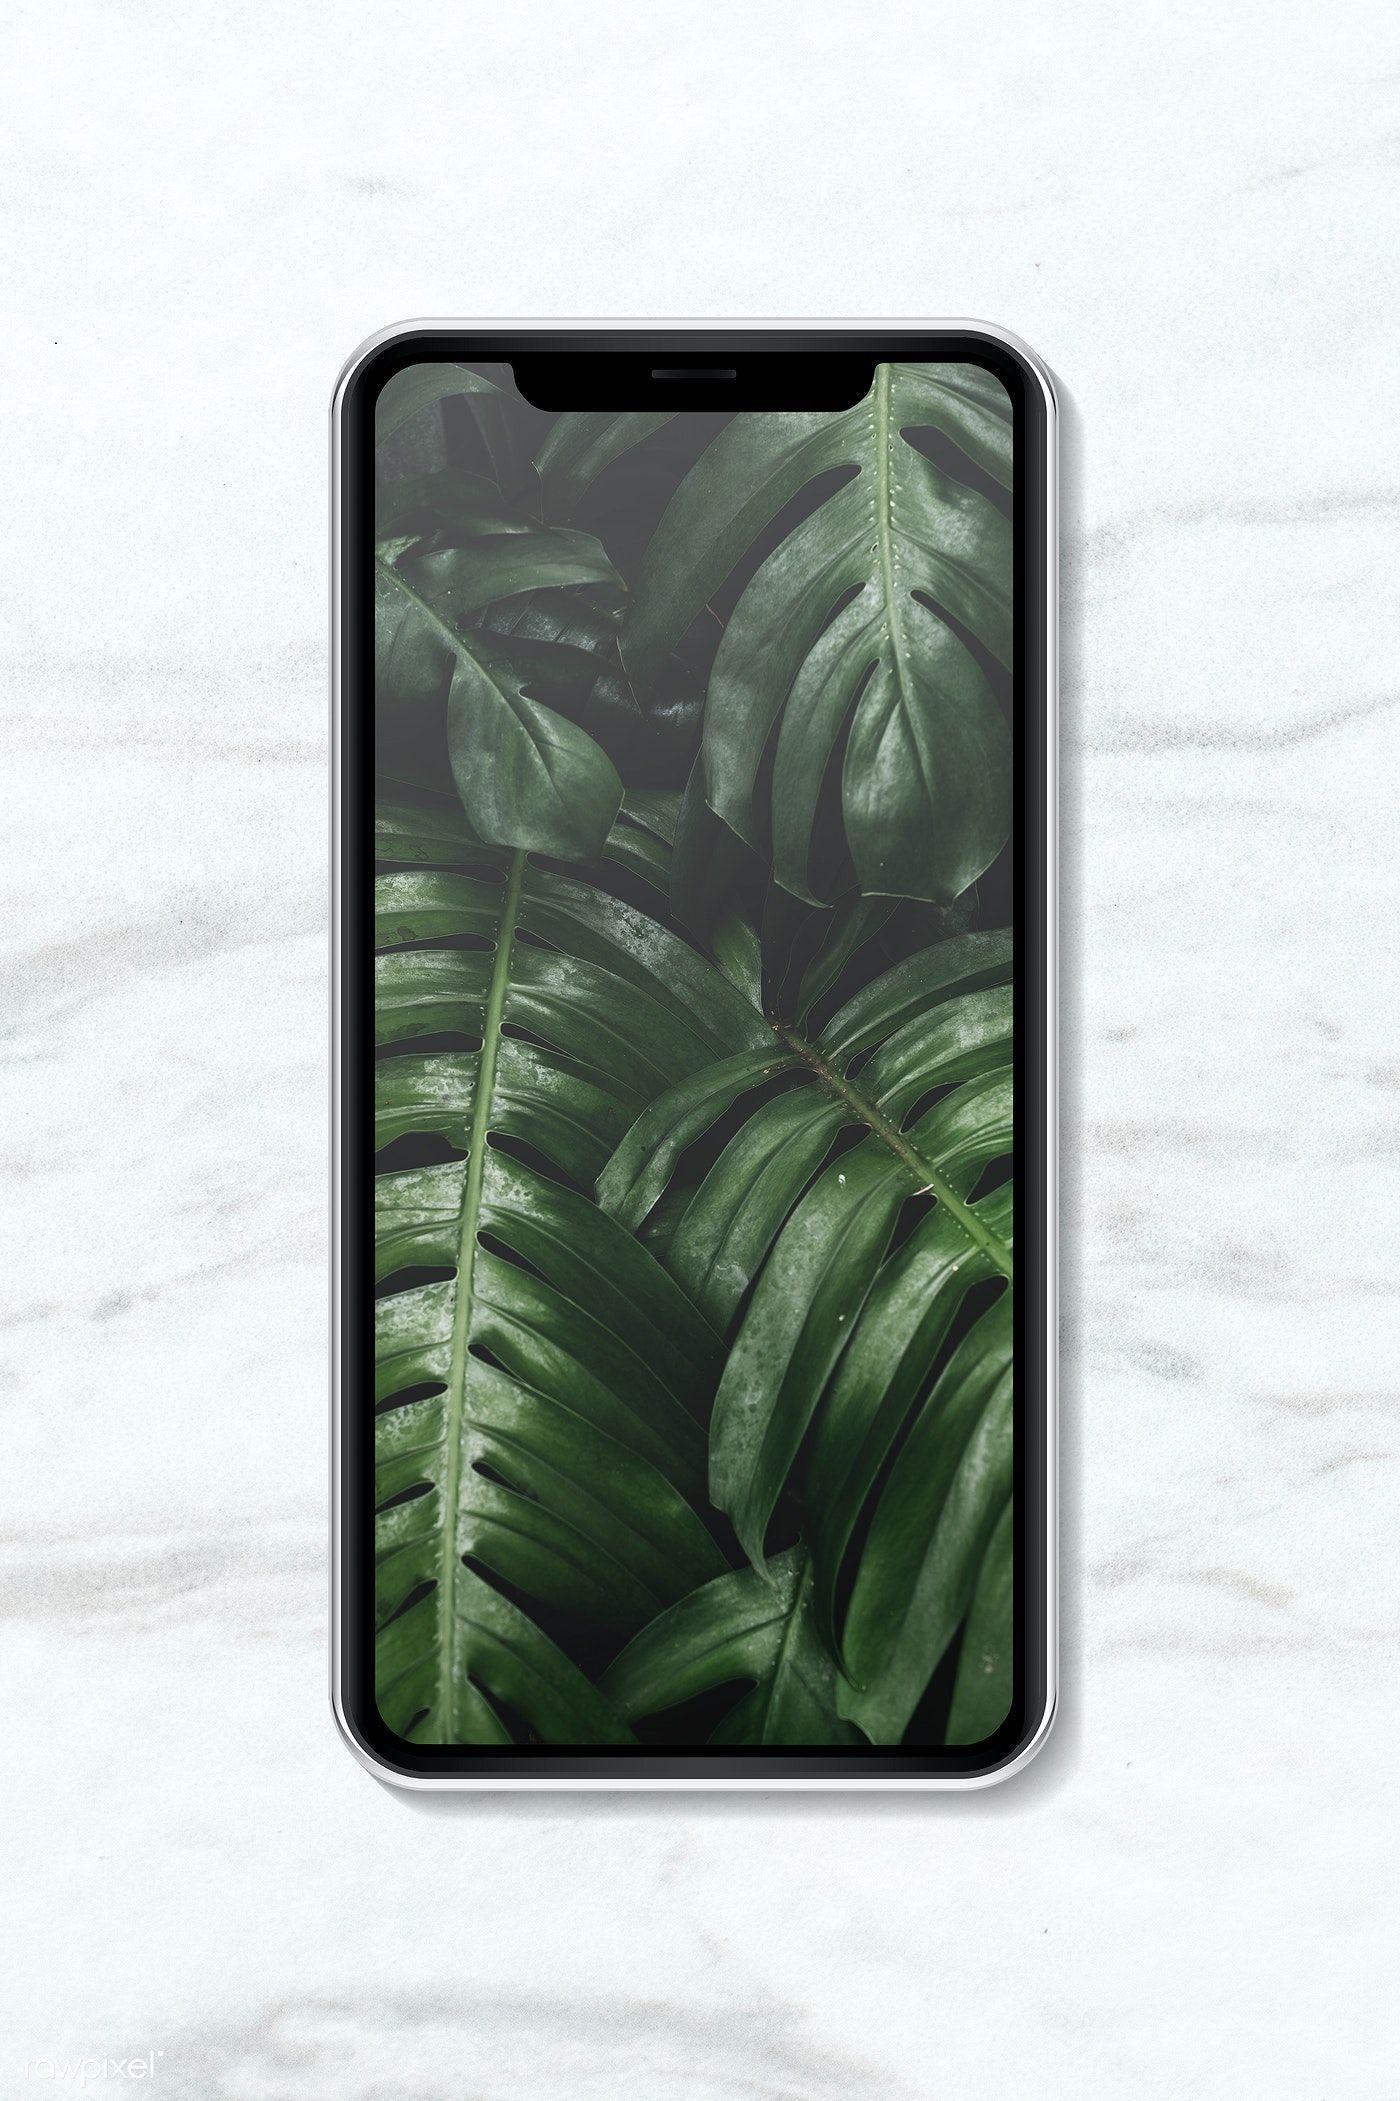 Download premium psd of Blank smartphone screen mockup